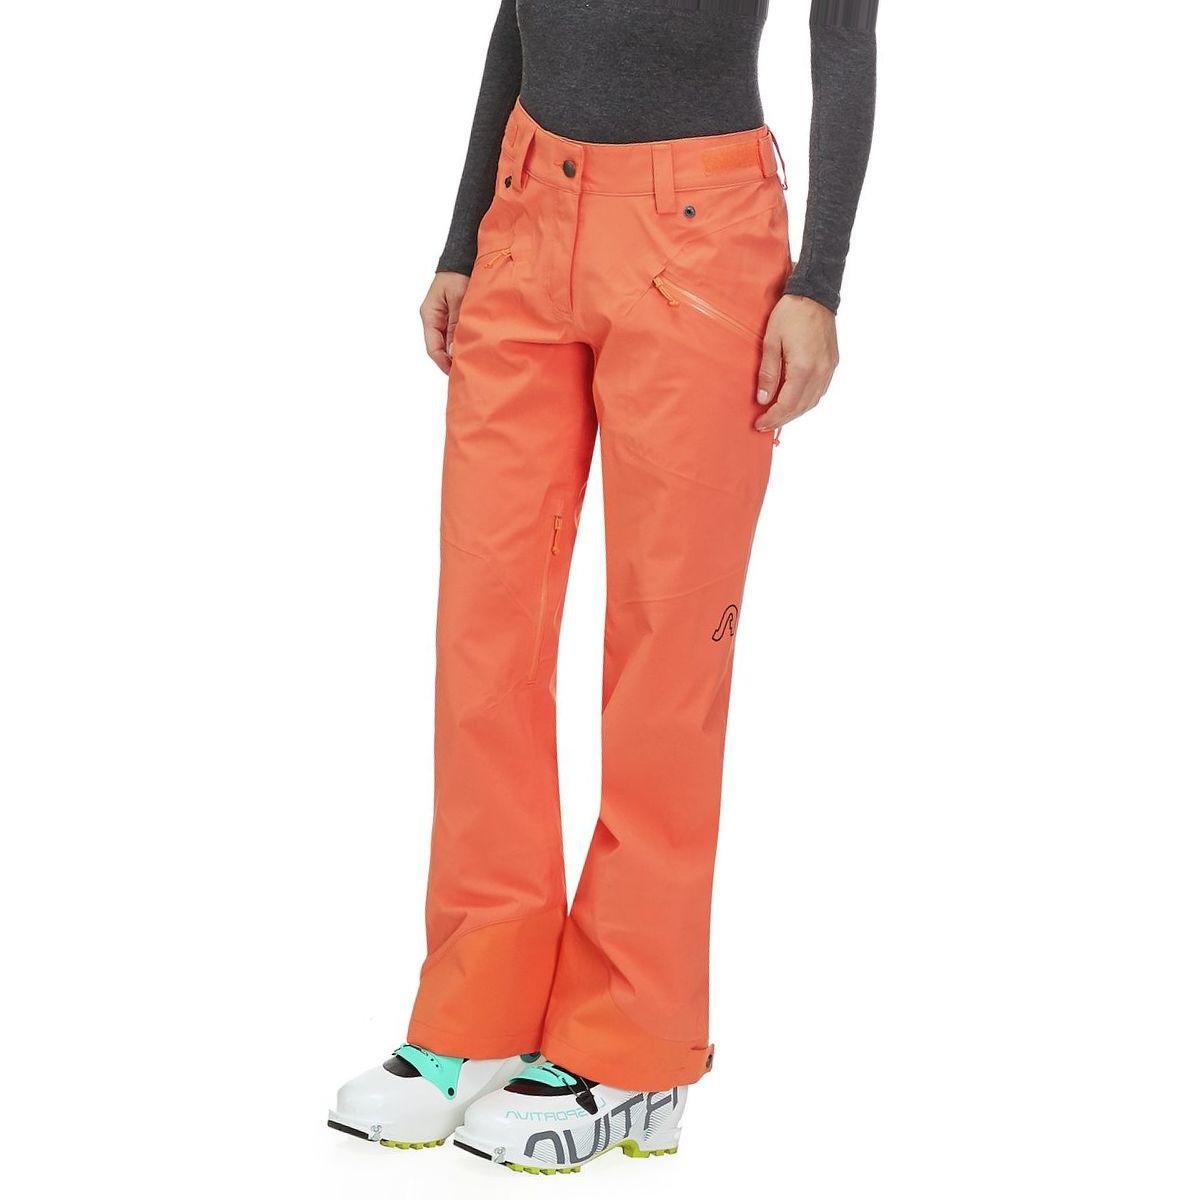 Flylow Donna 2.1 Pant - Women's